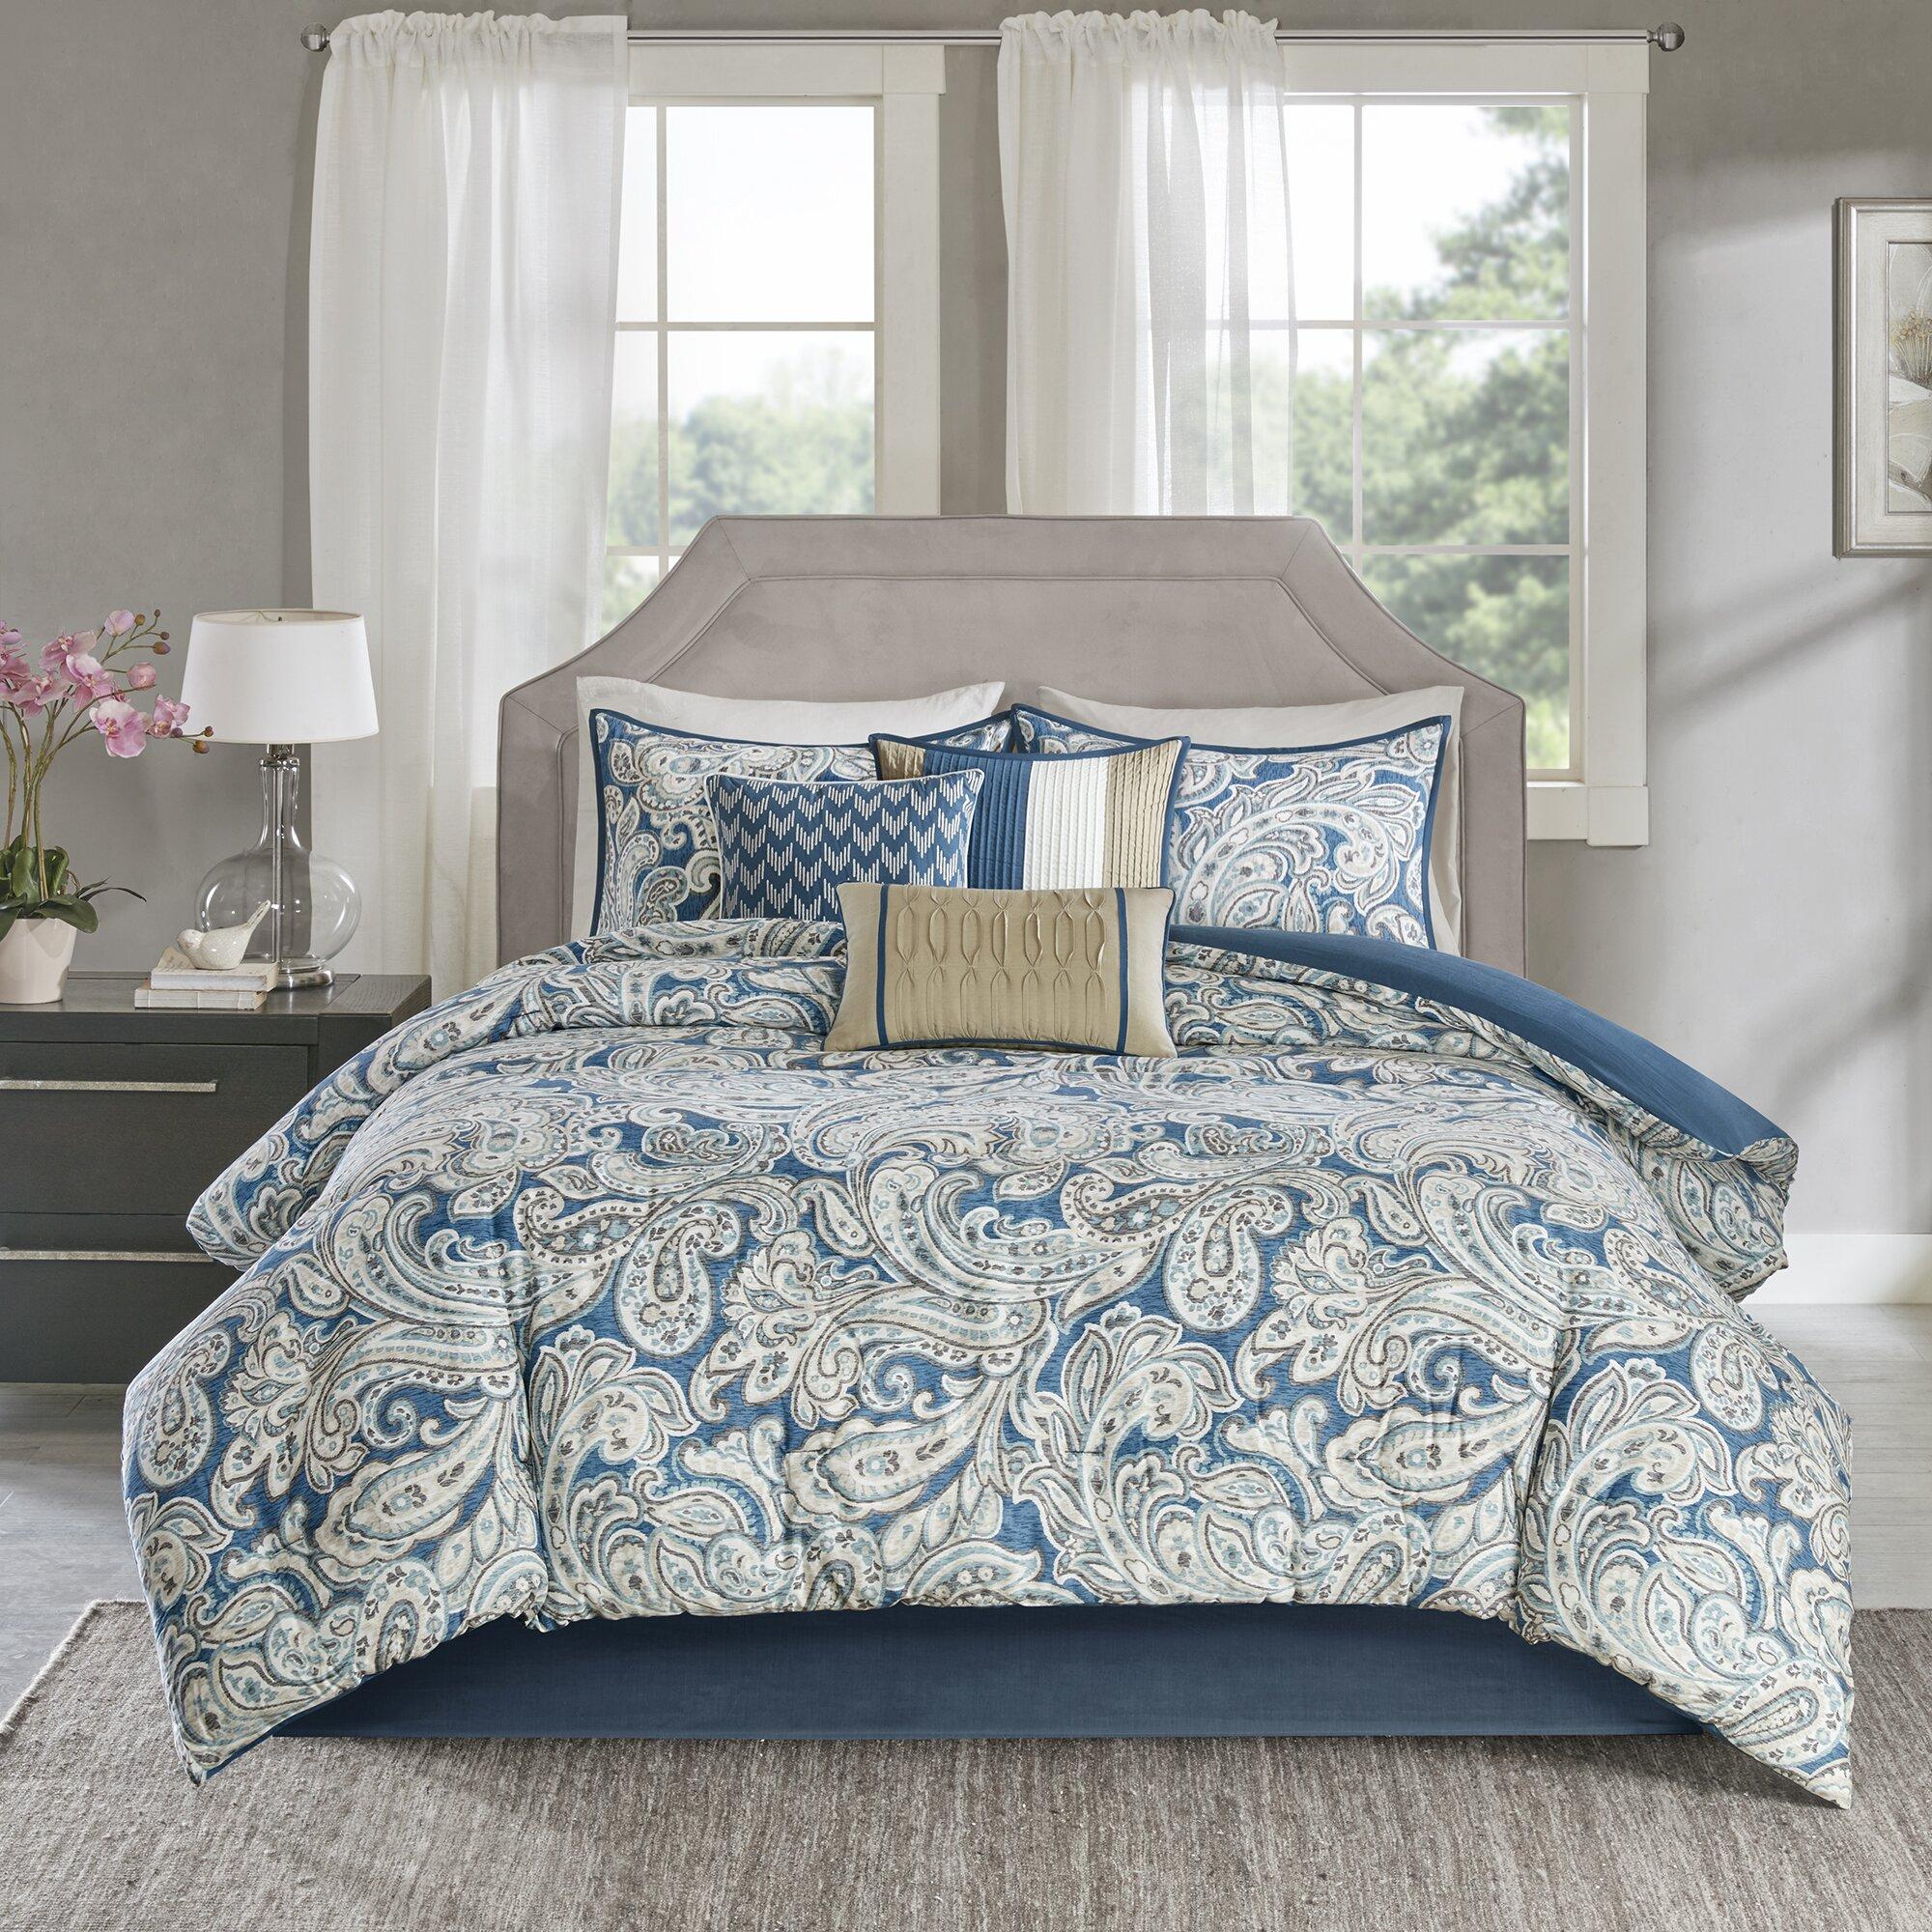 astoria grand arterbury 7 piece comforter set reviews wayfair. Black Bedroom Furniture Sets. Home Design Ideas